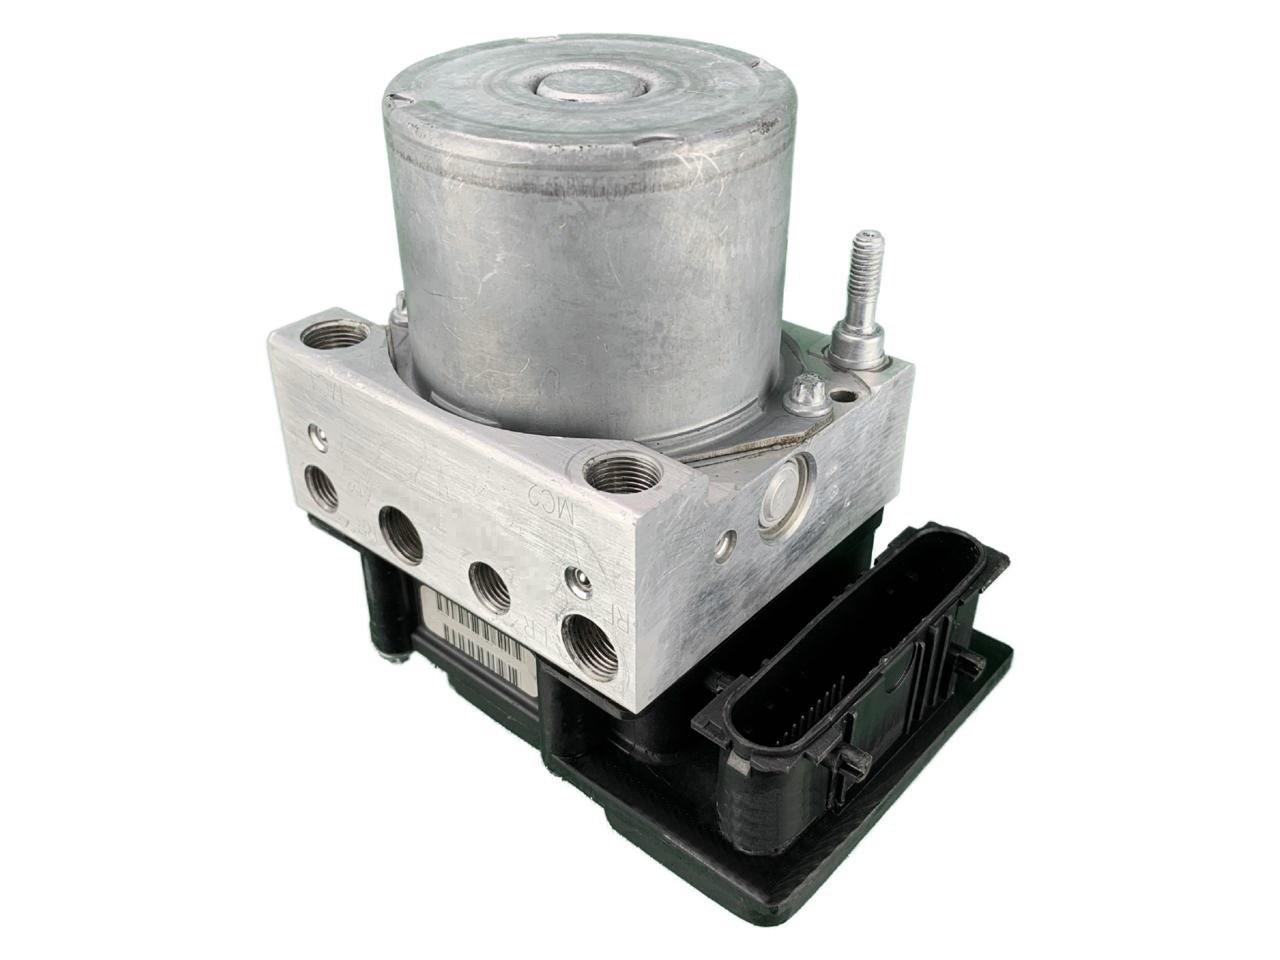 Unidade Hidraulica Bomba Modulo Central Centralina Motor de Freio Abs Valvula Bosch 51818960 0265232242 0265800790 Fiat Idea 011 012 013